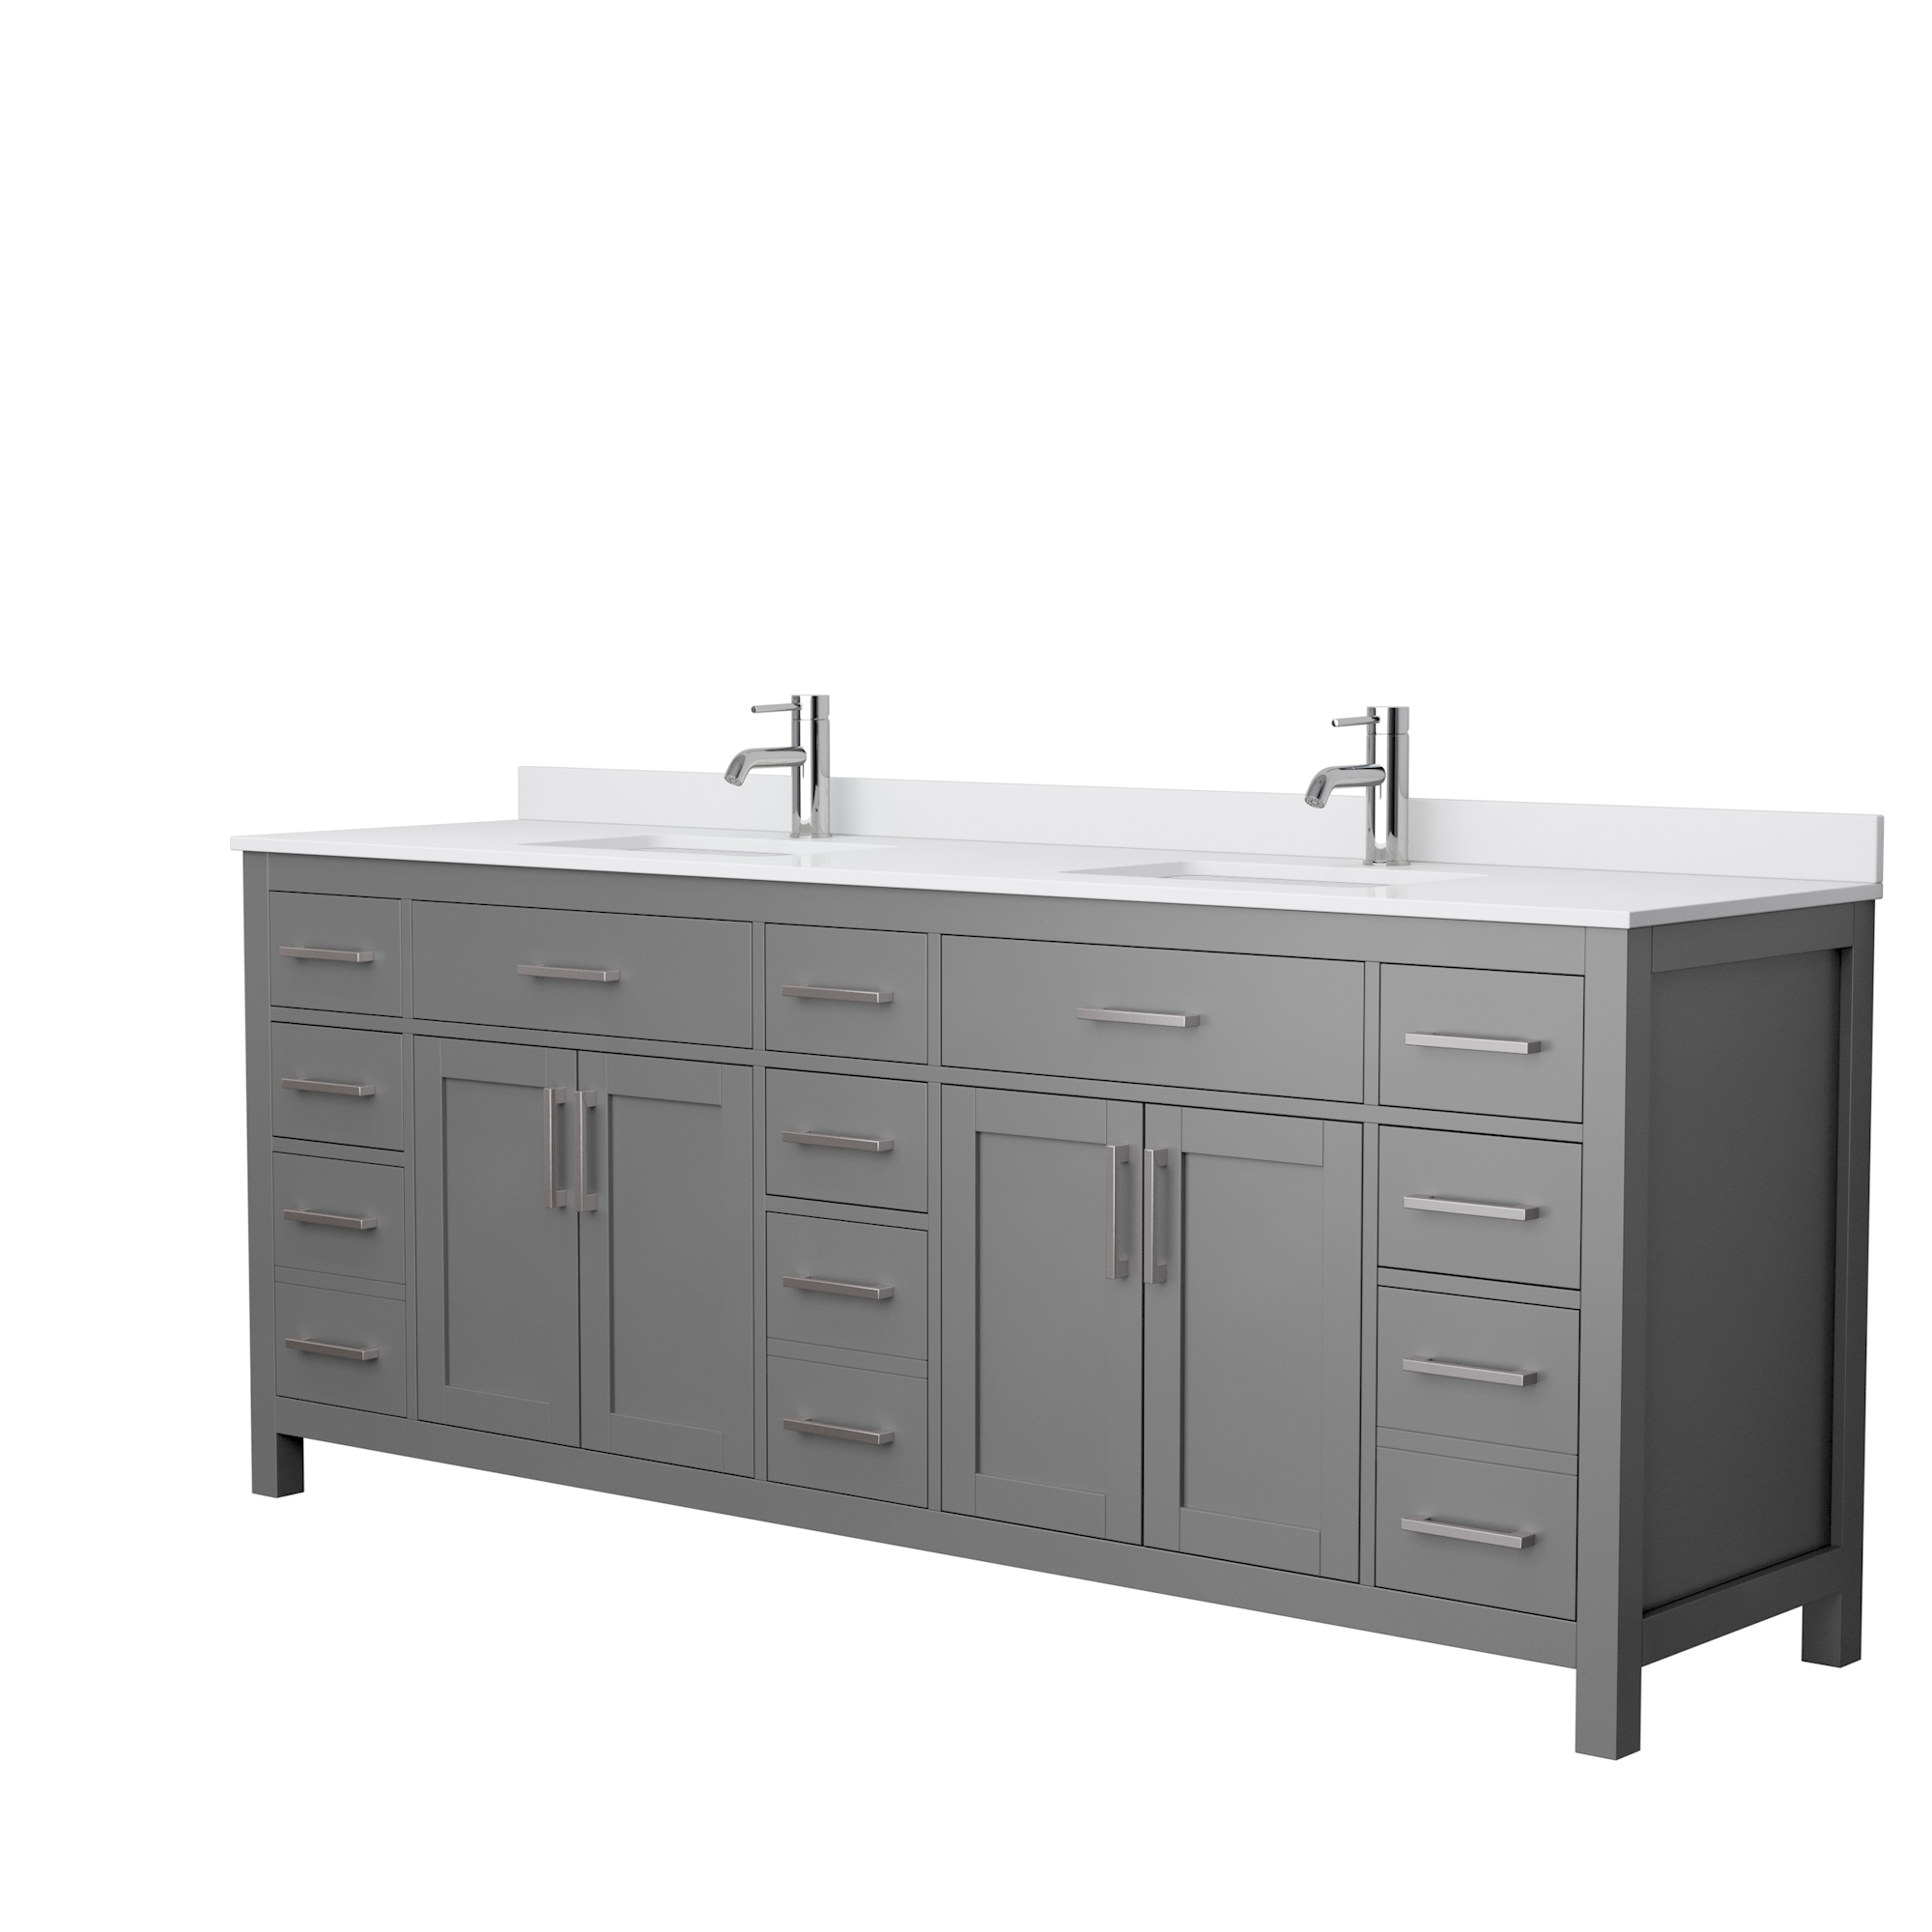 Beckett 84 Double Bathroom Vanity Dark Gray Beautiful Bathroom Furniture For Every Home Wyndham Collection